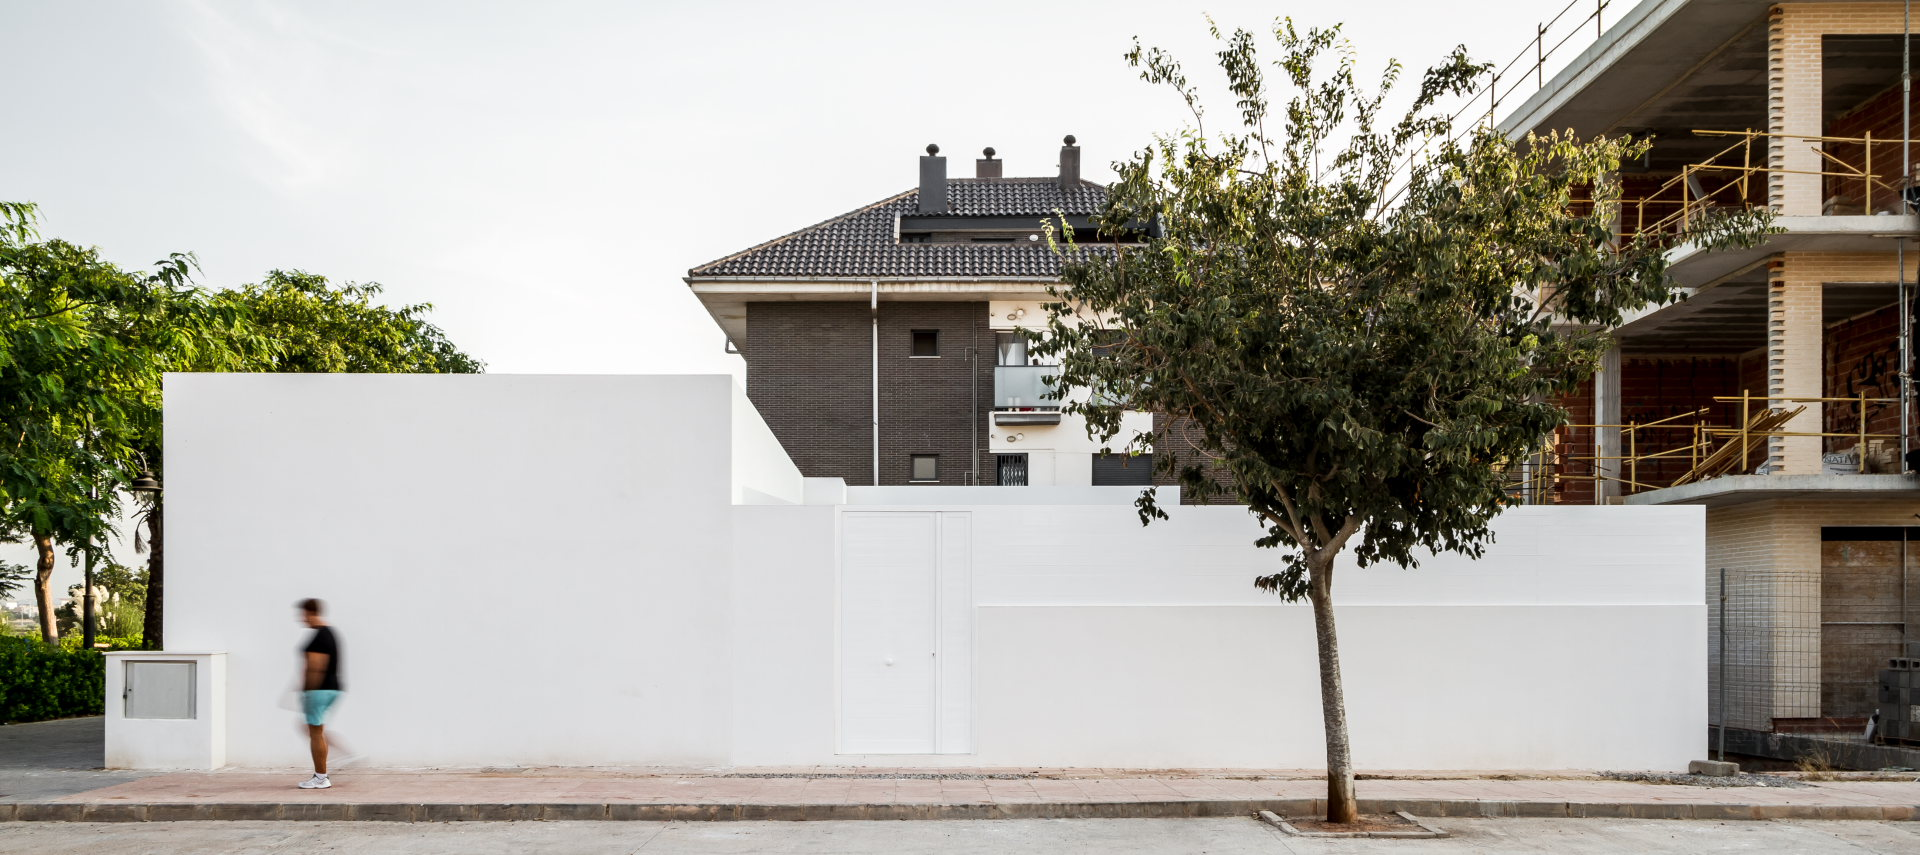 fotografia-arquitectura-valencia-german-cabo-viraje-museros (1)